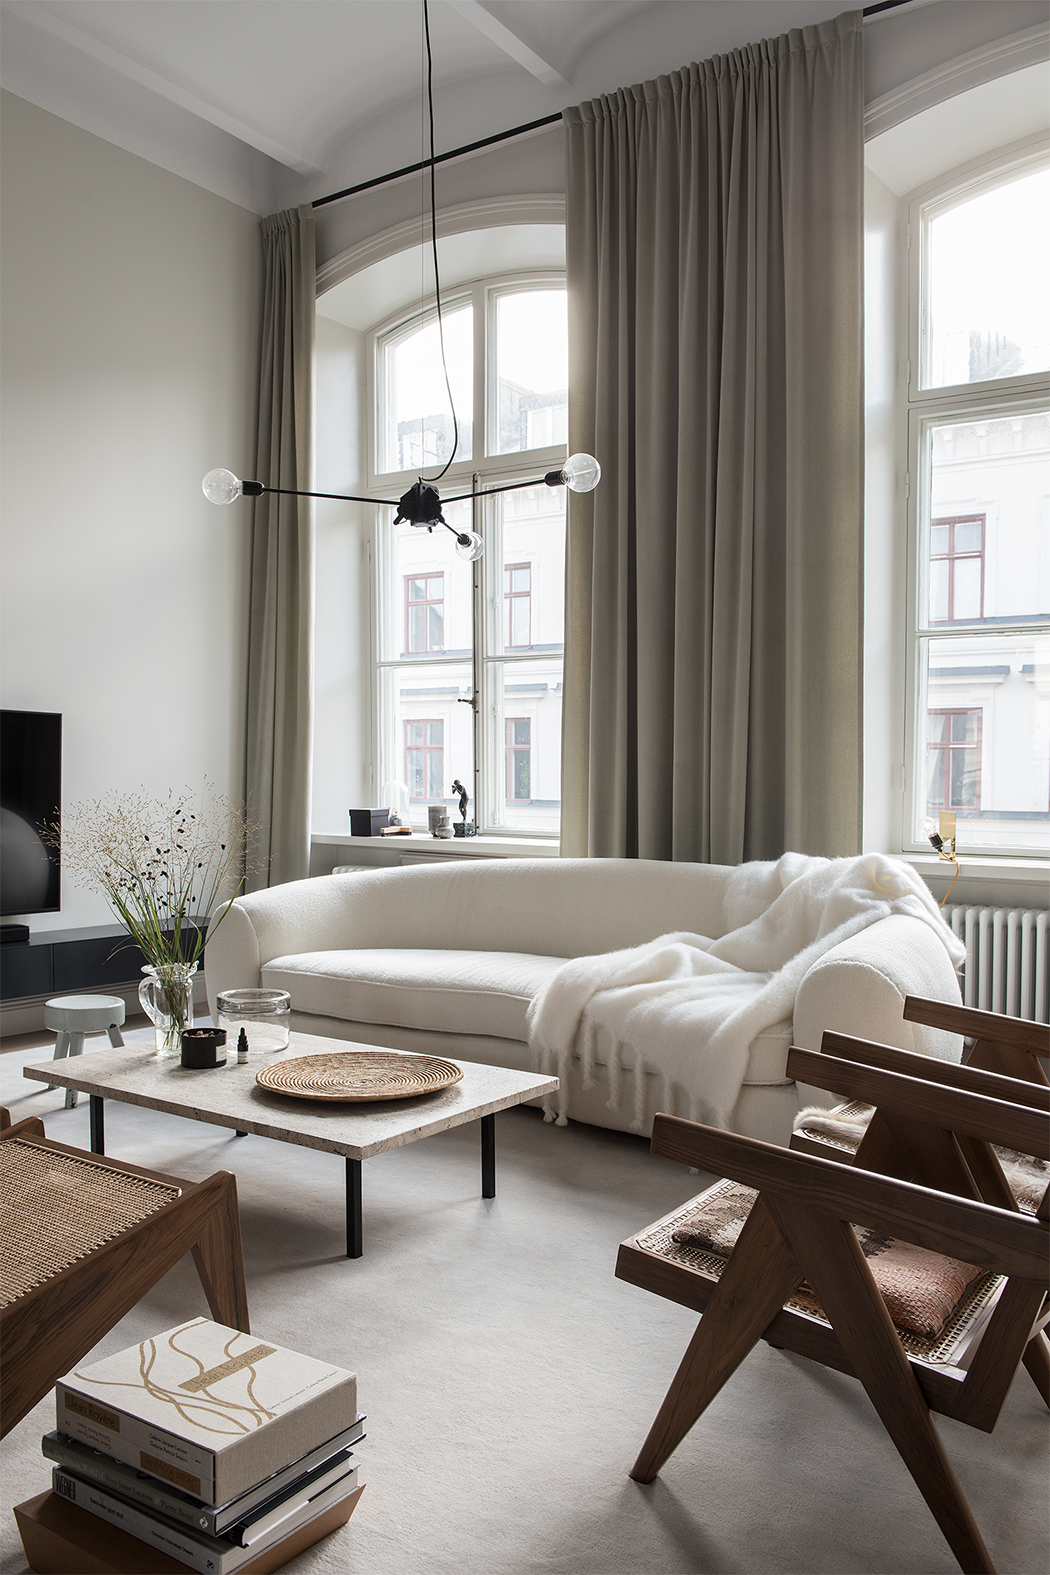 Living room window ideas  lotta agaton interiors  interior design livingroom  pinterest